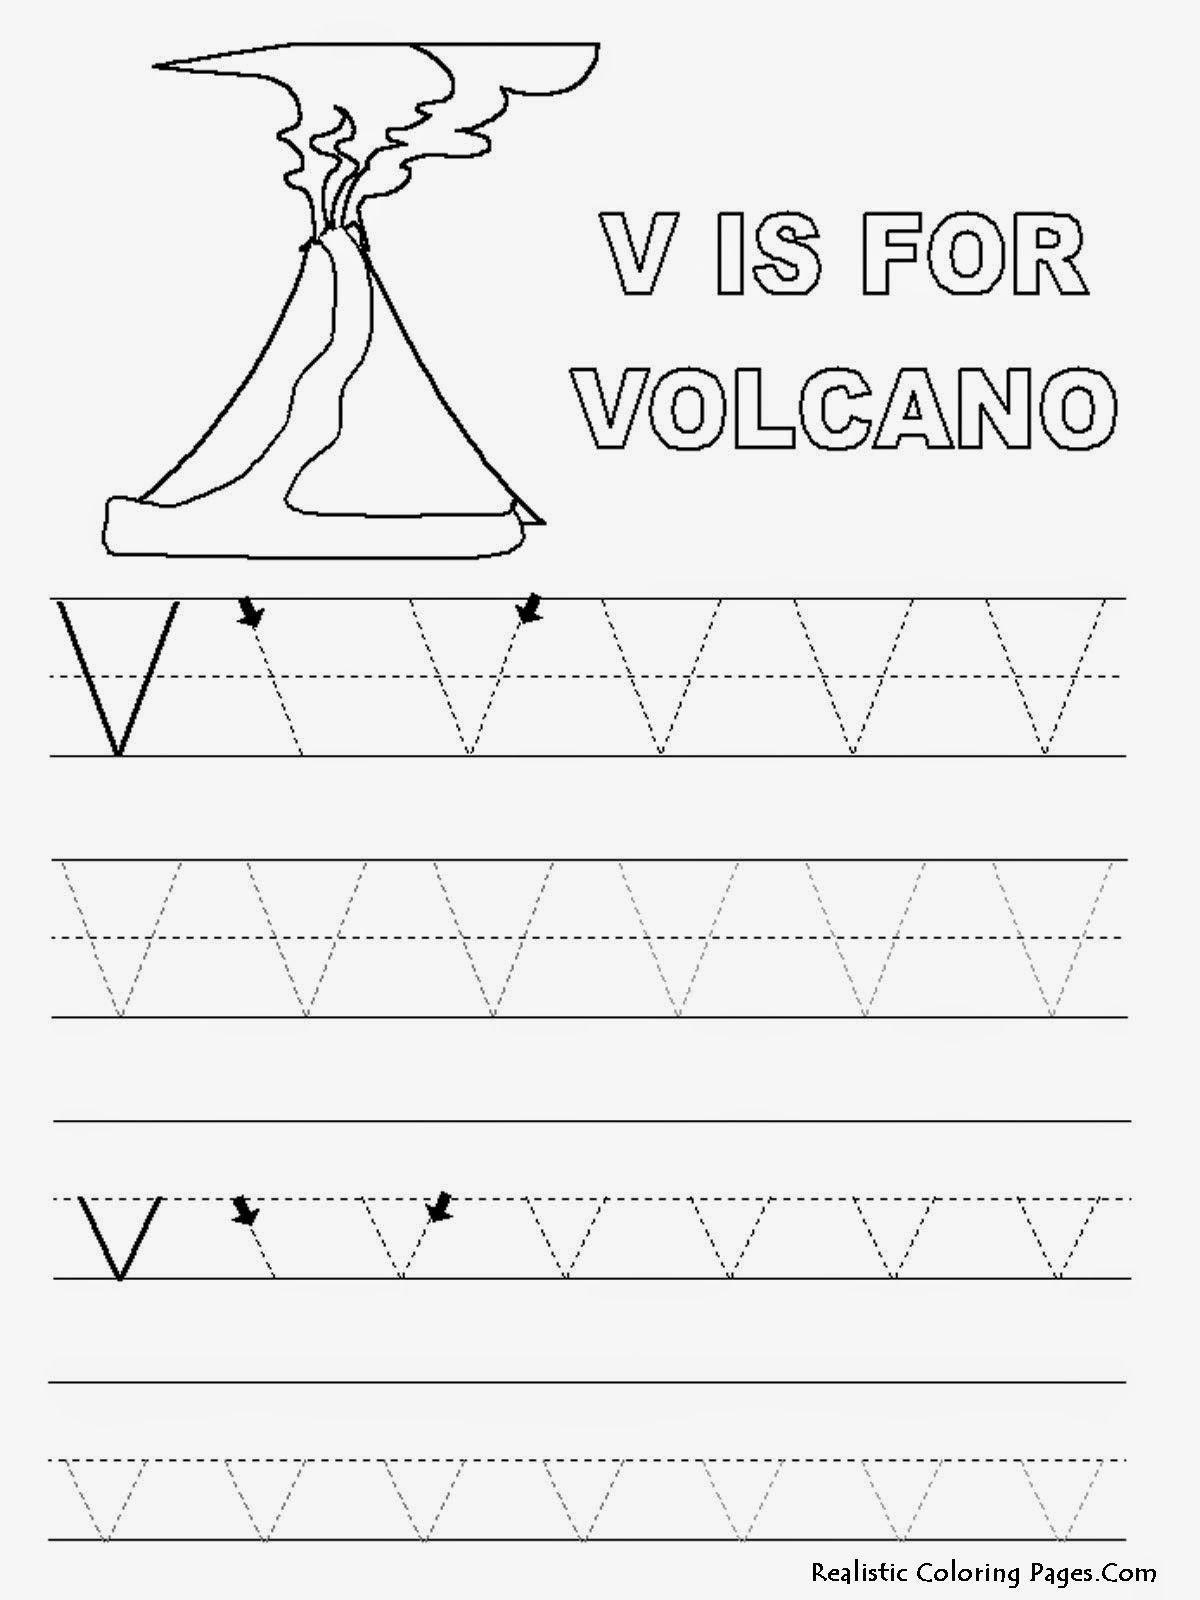 Alphabet Tracer Pages V Volcano Image